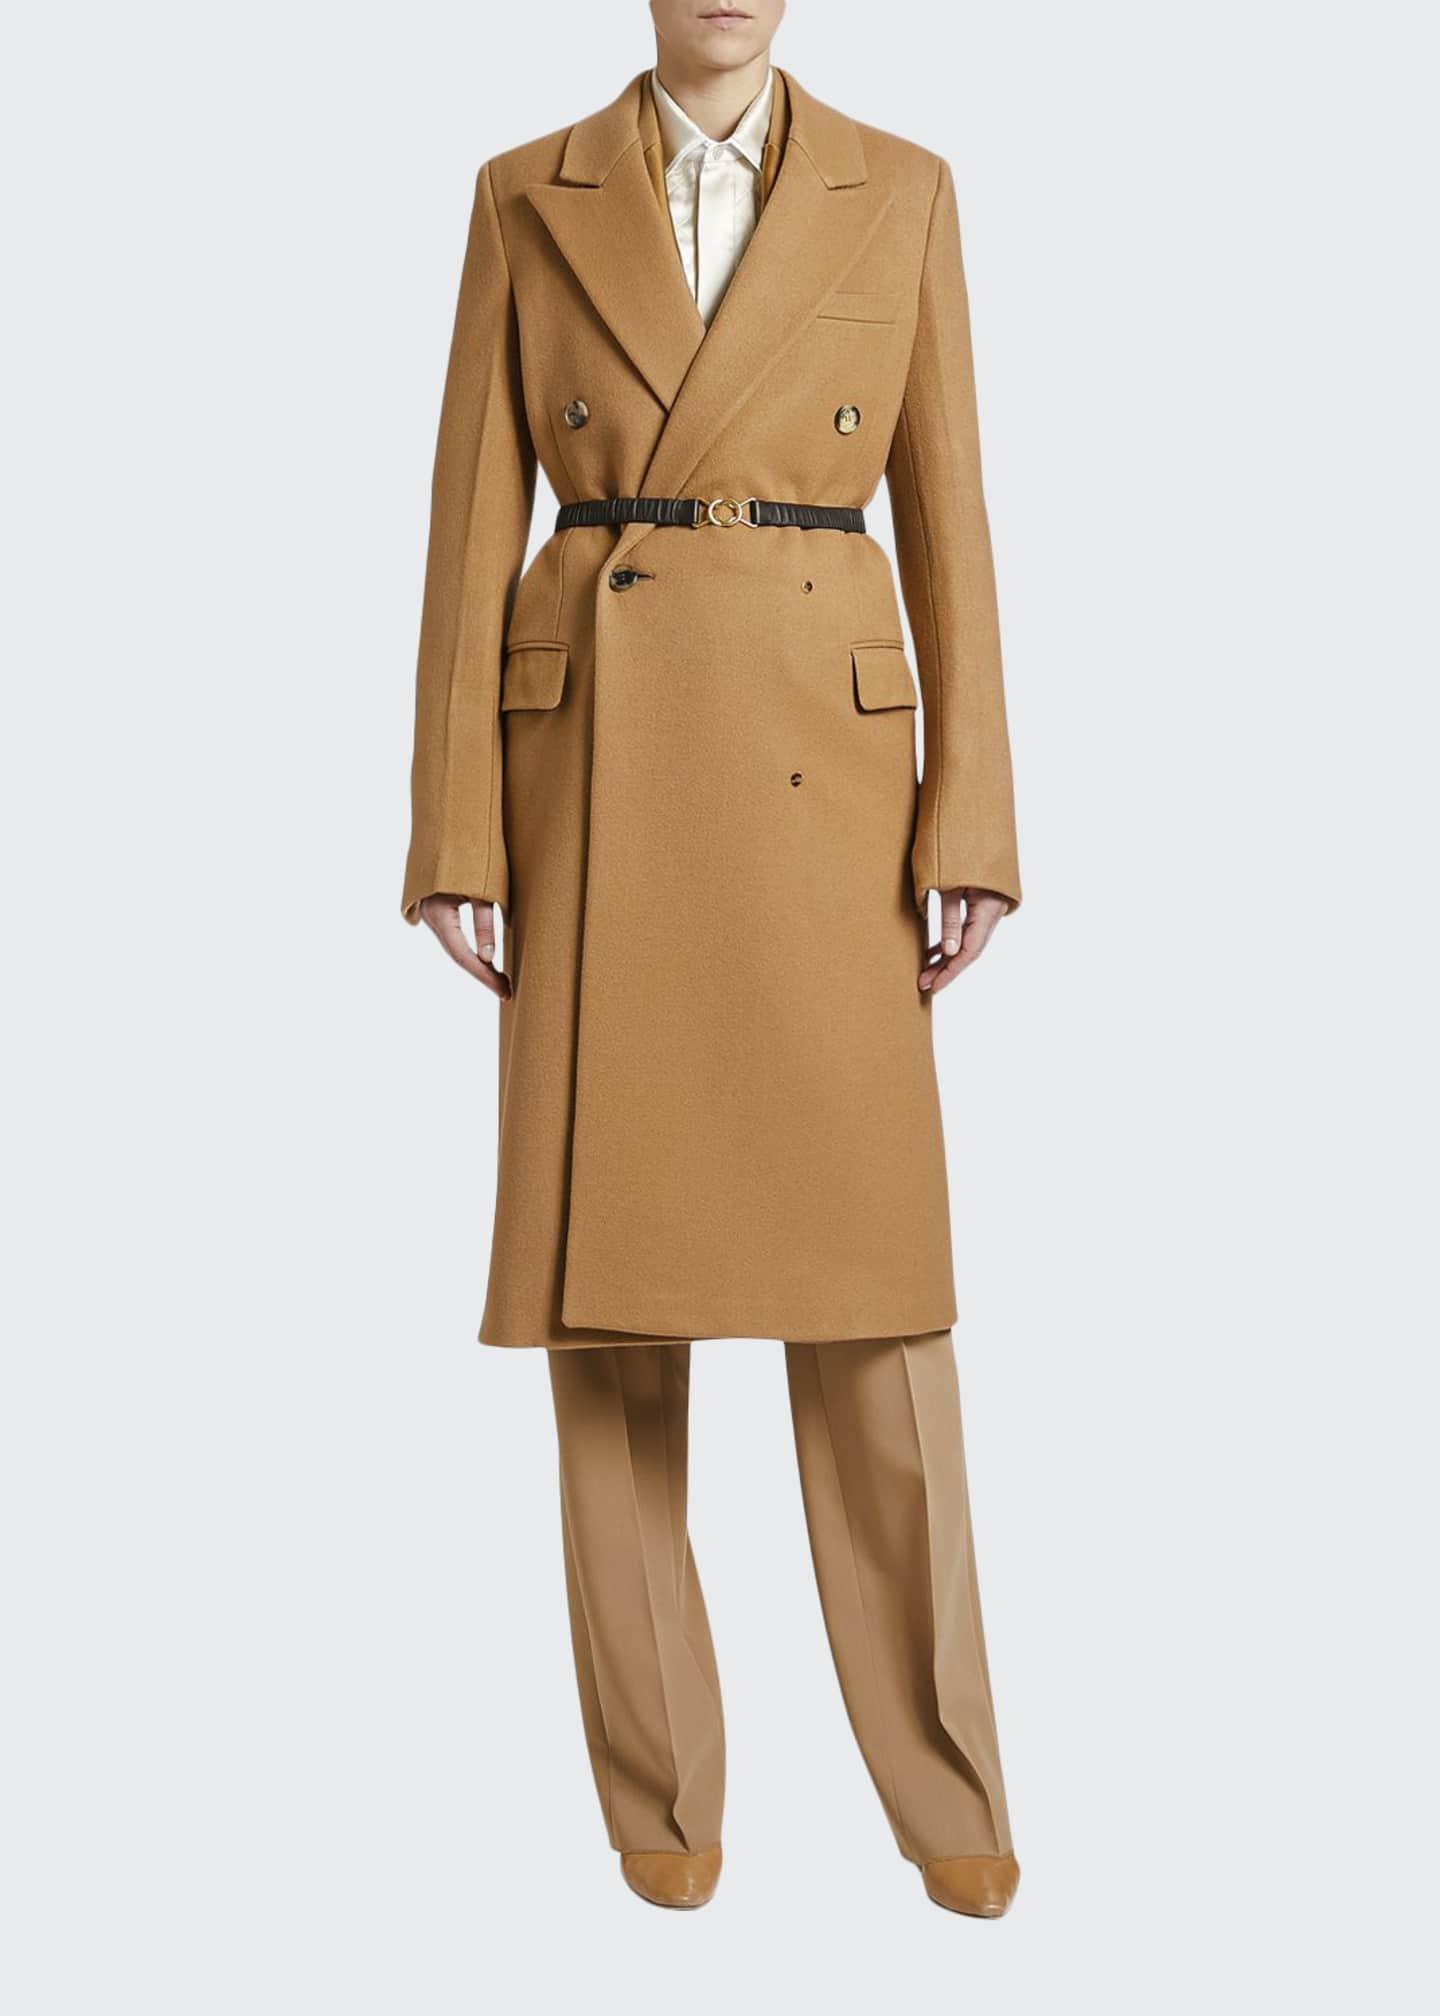 Bottega Veneta Compact Wool Double-Breasted Coat